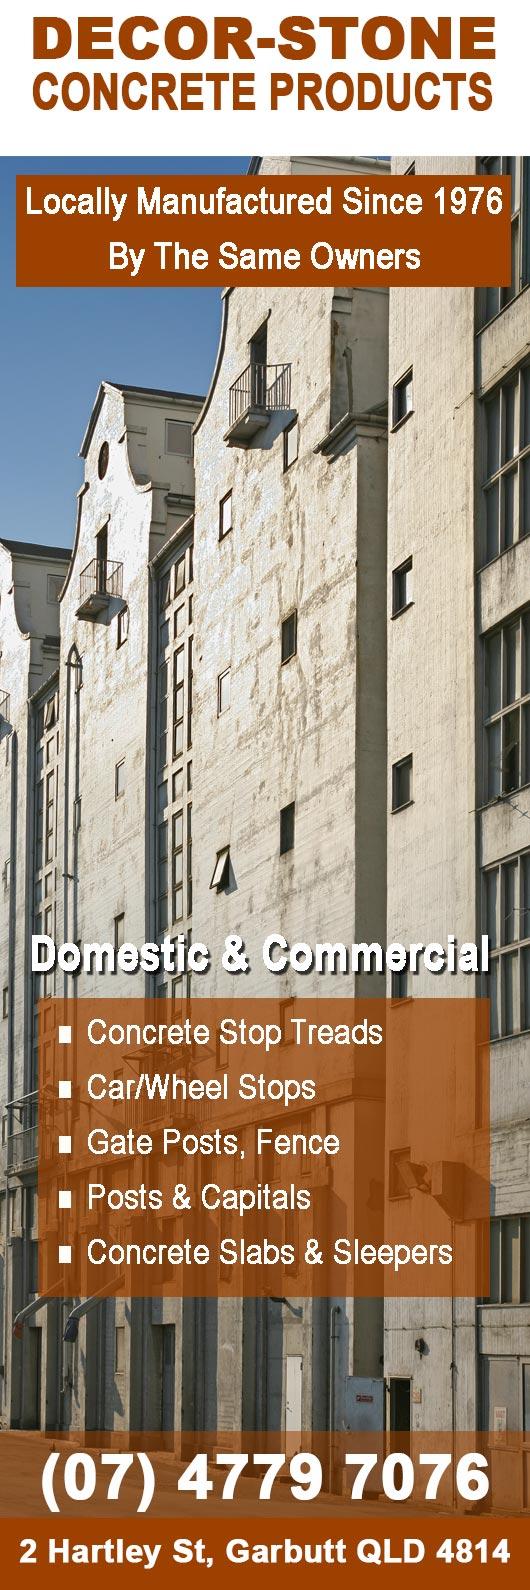 decor-stone concrete products - concrete products - 2 hartley st